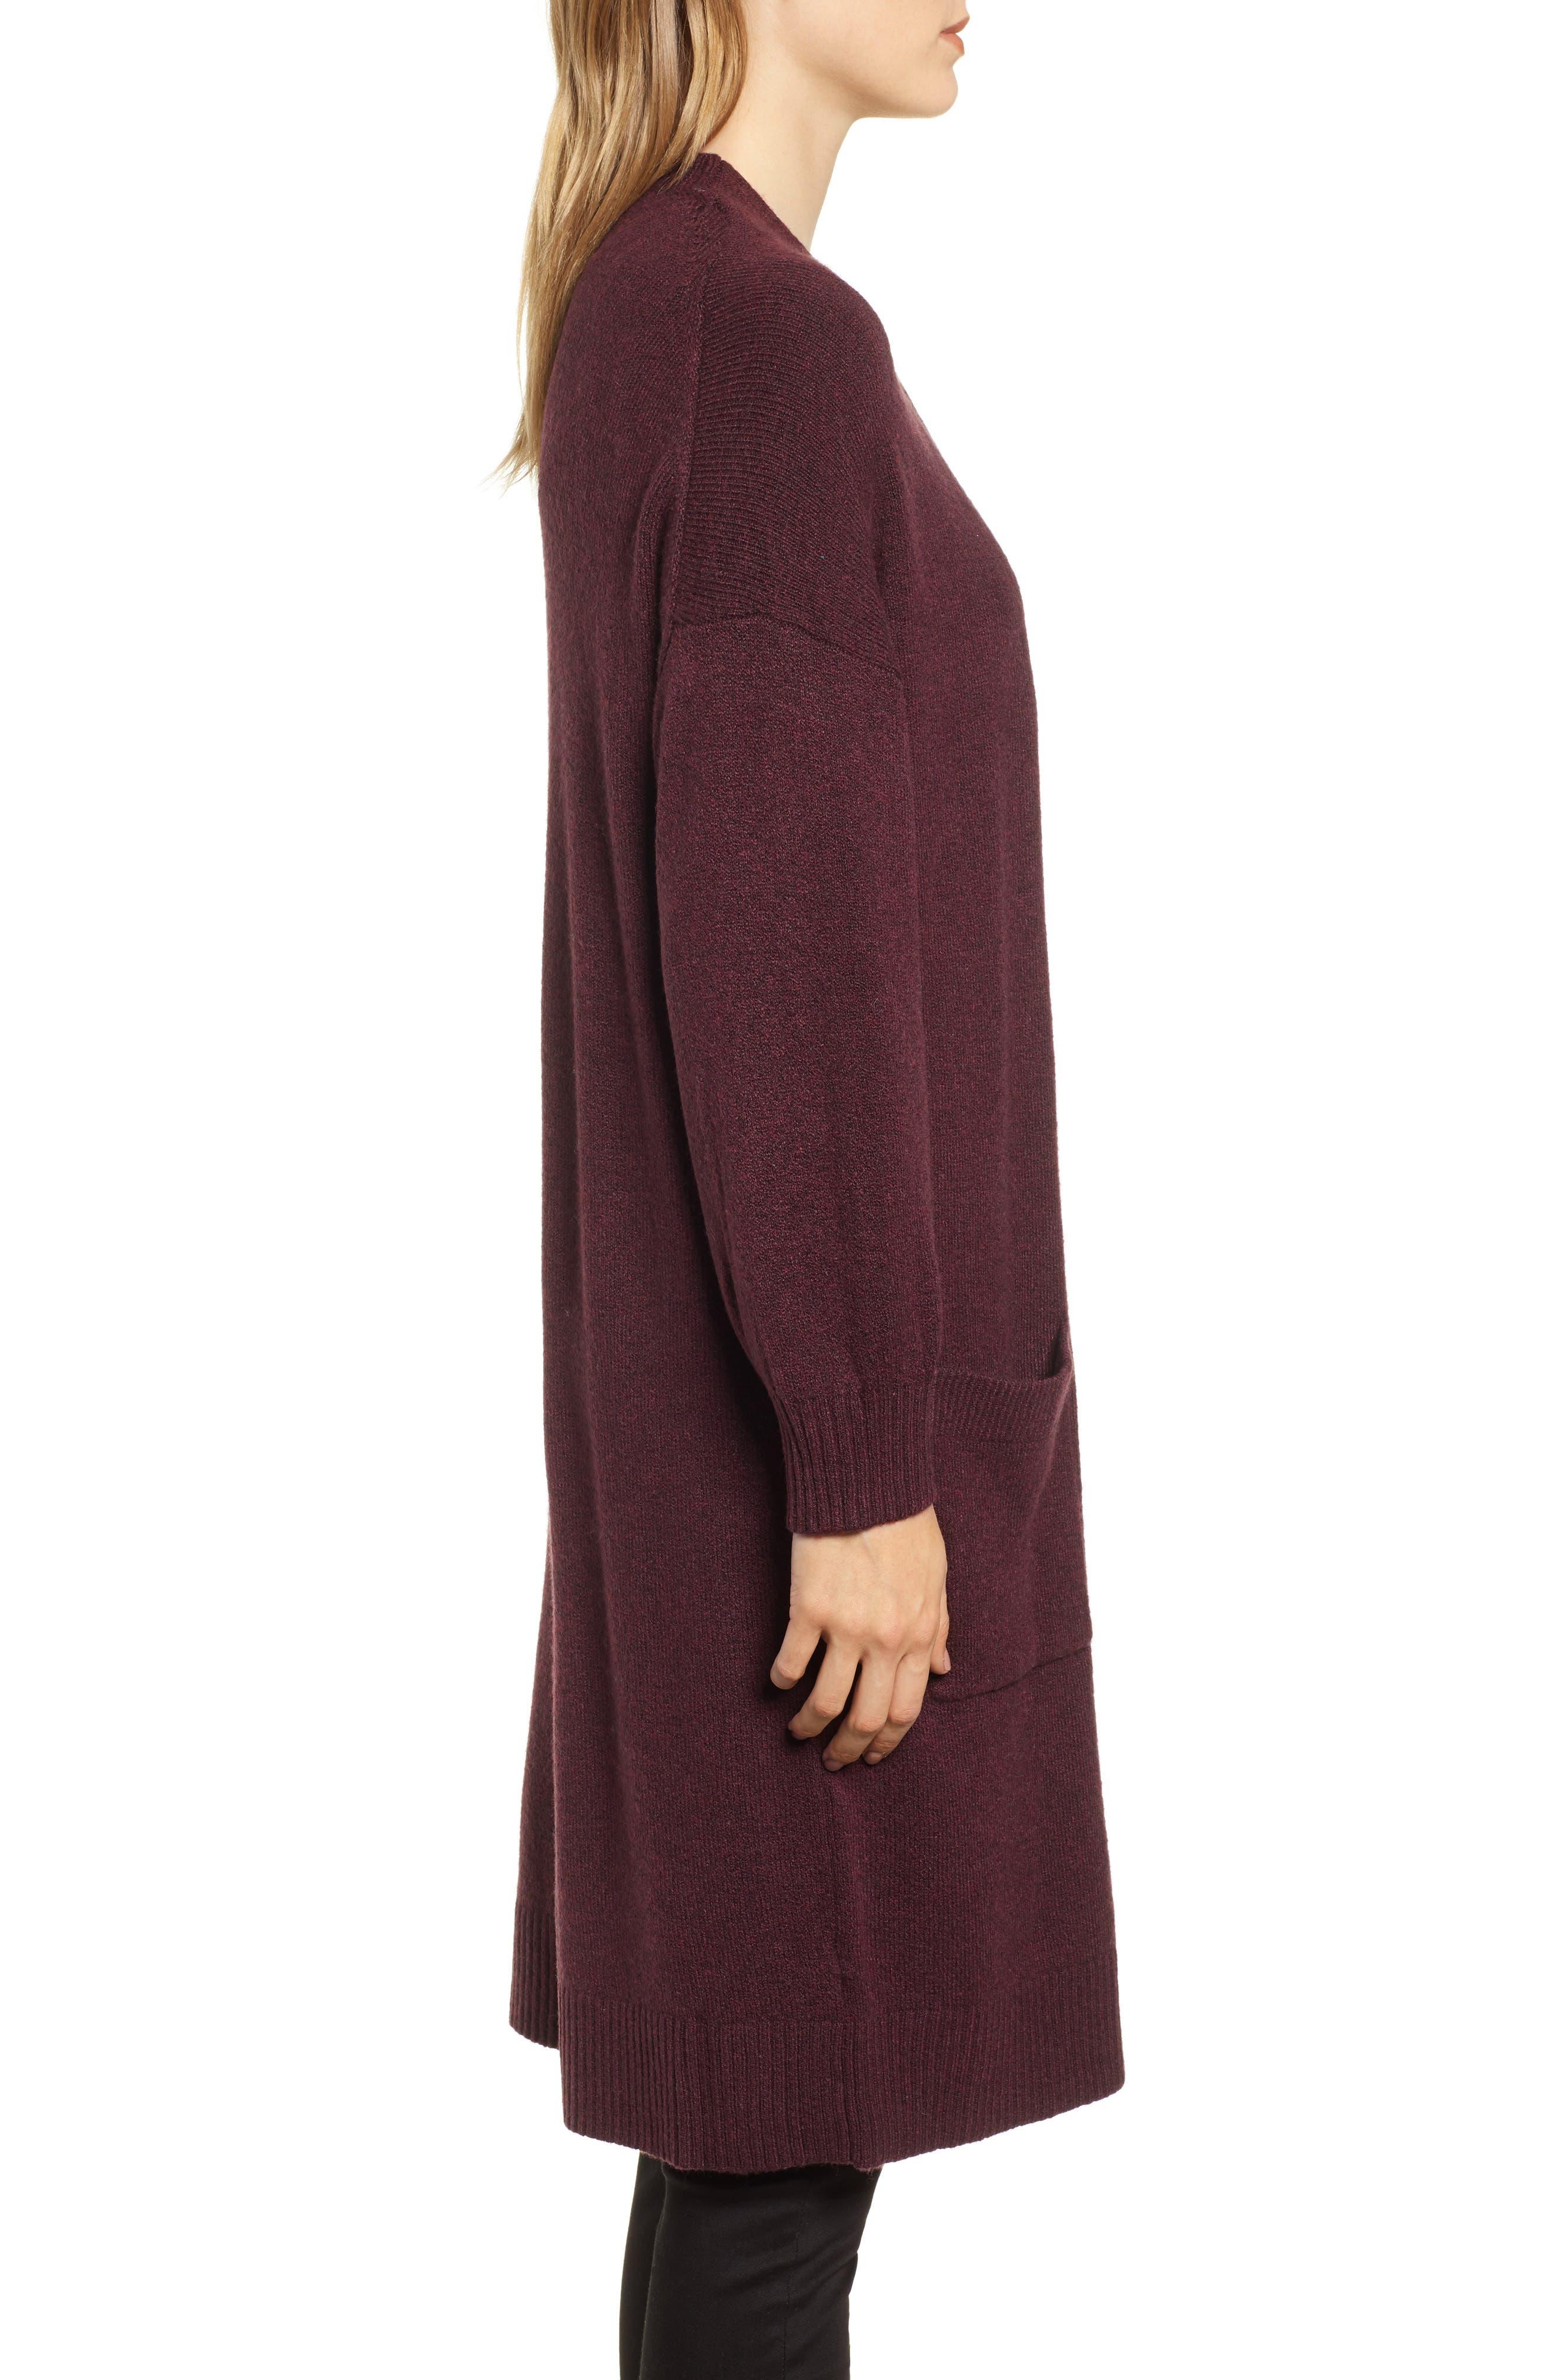 Pocket Sweater Coat,                             Alternate thumbnail 3, color,                             BURGUNDY TO MATCH DRESS